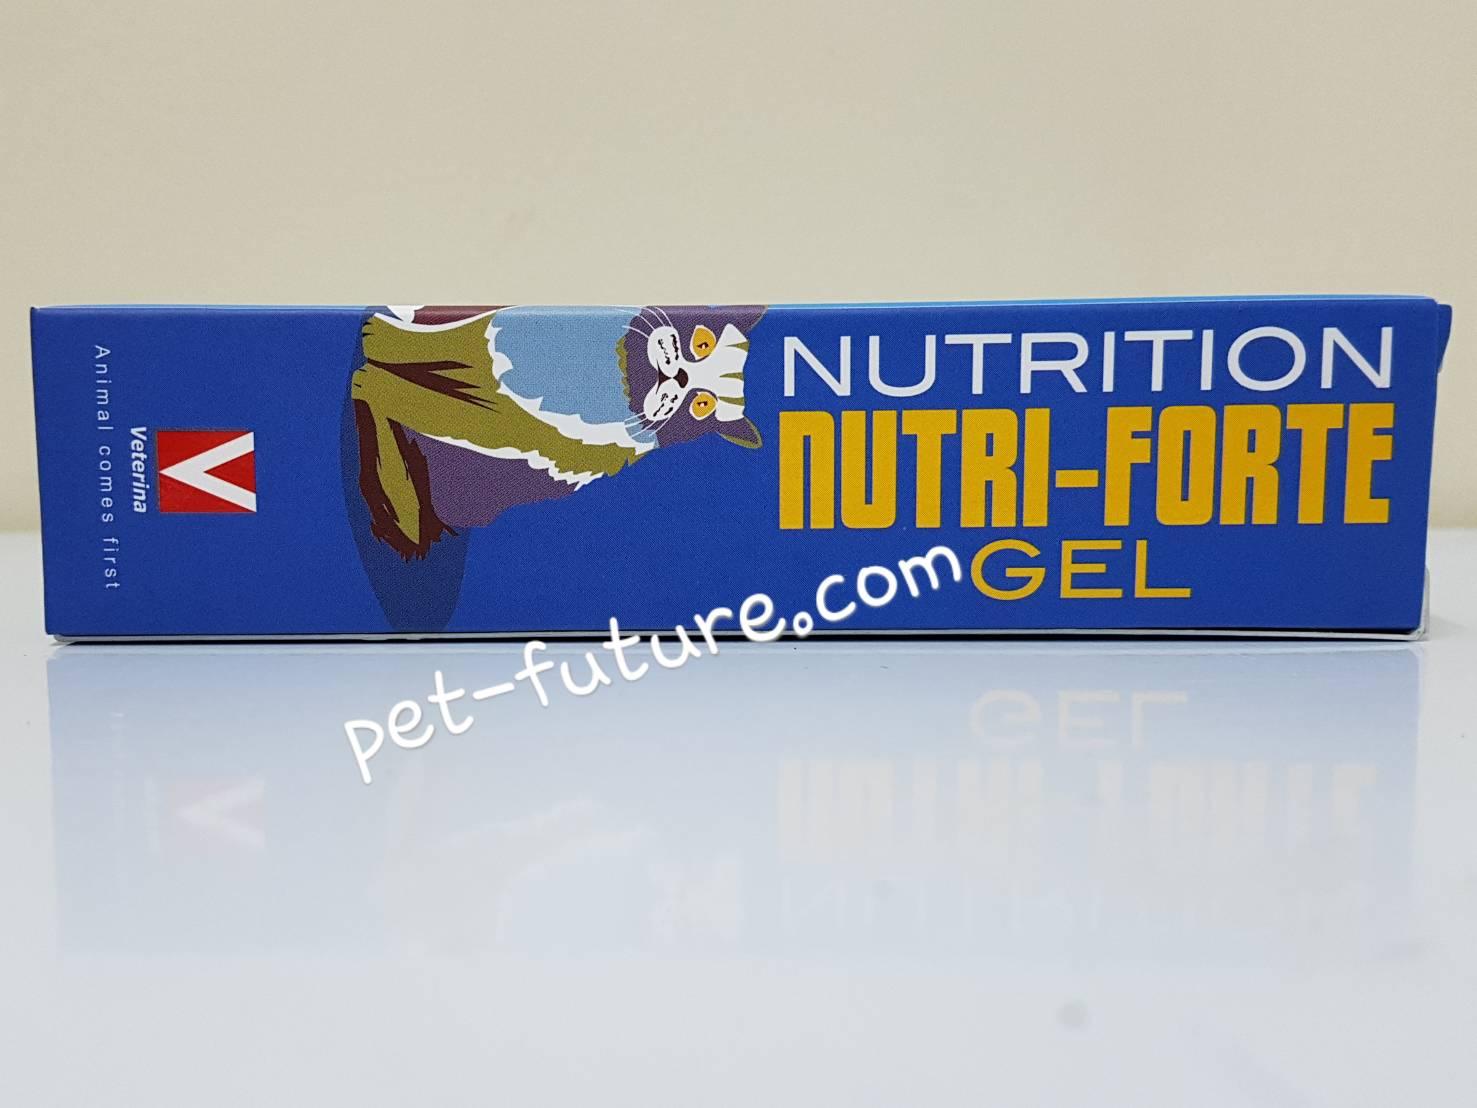 Nutri-Forte Gel อาหารเสริมสำหรับสุนัขและแมวทุกขนาดและอายุ ขนาด 100 g. Exp.05/18